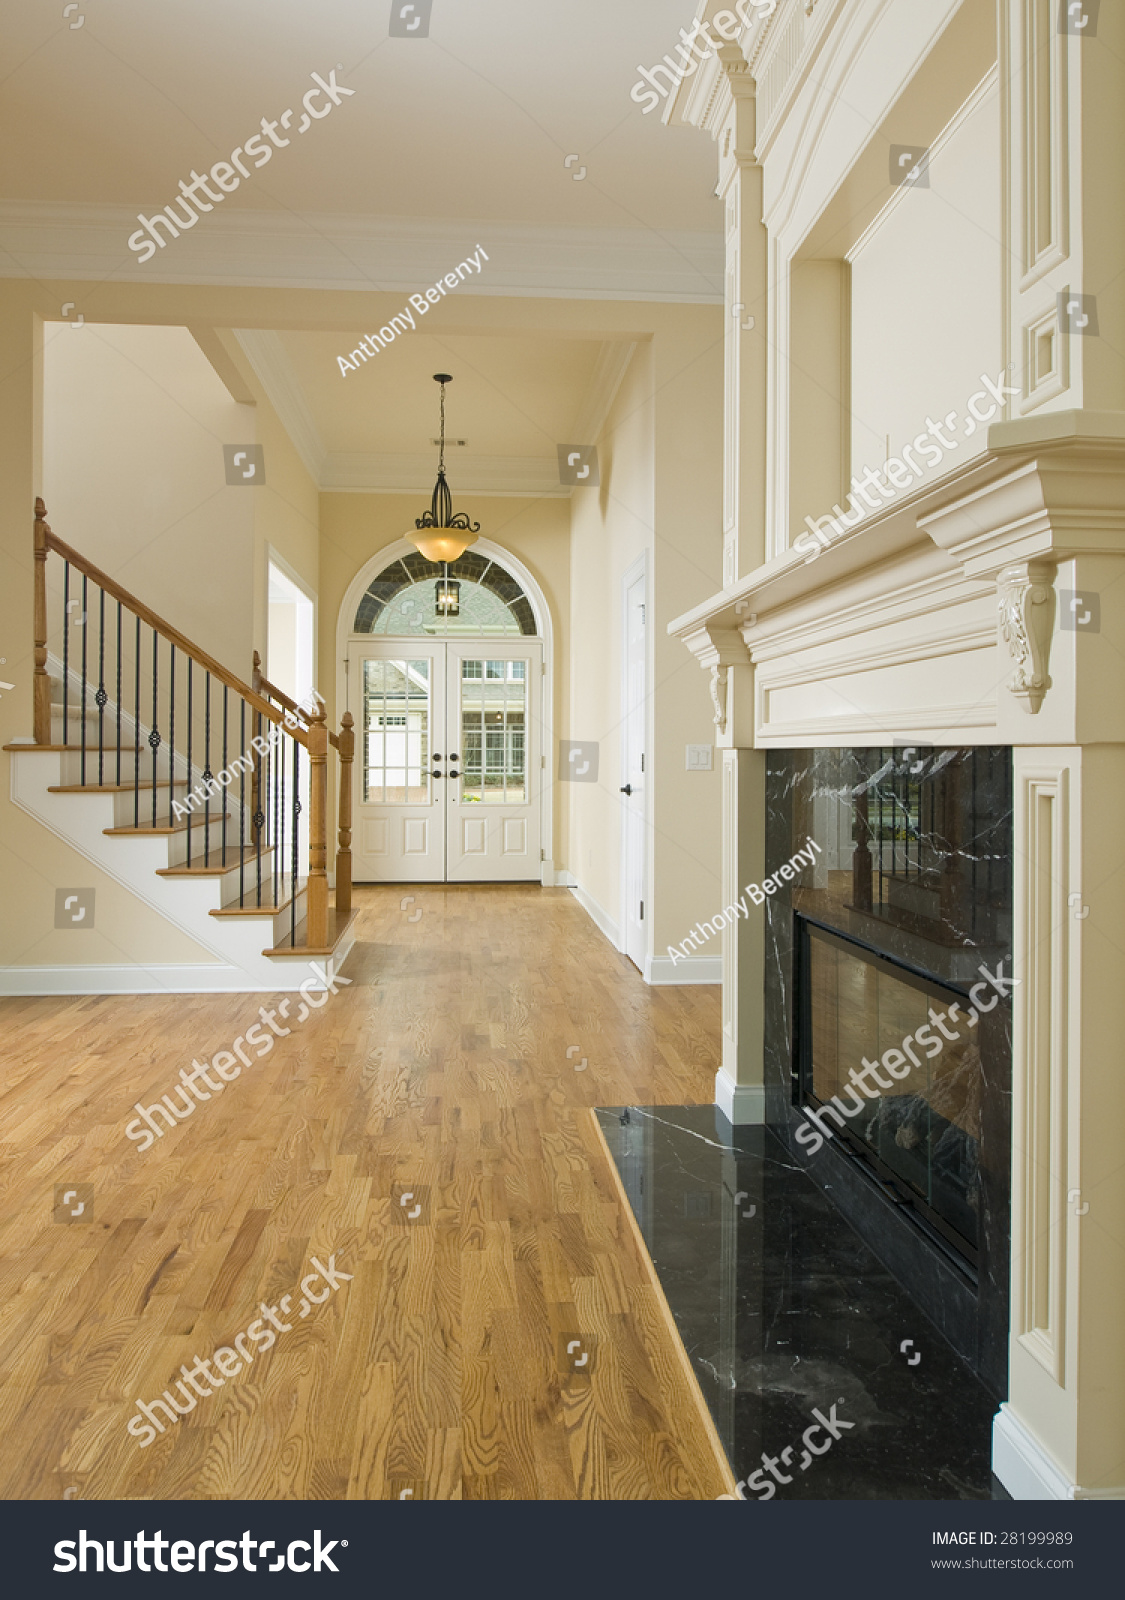 Luxury Home Foyer : Luxury home foyer door staircase fireplace stock photo